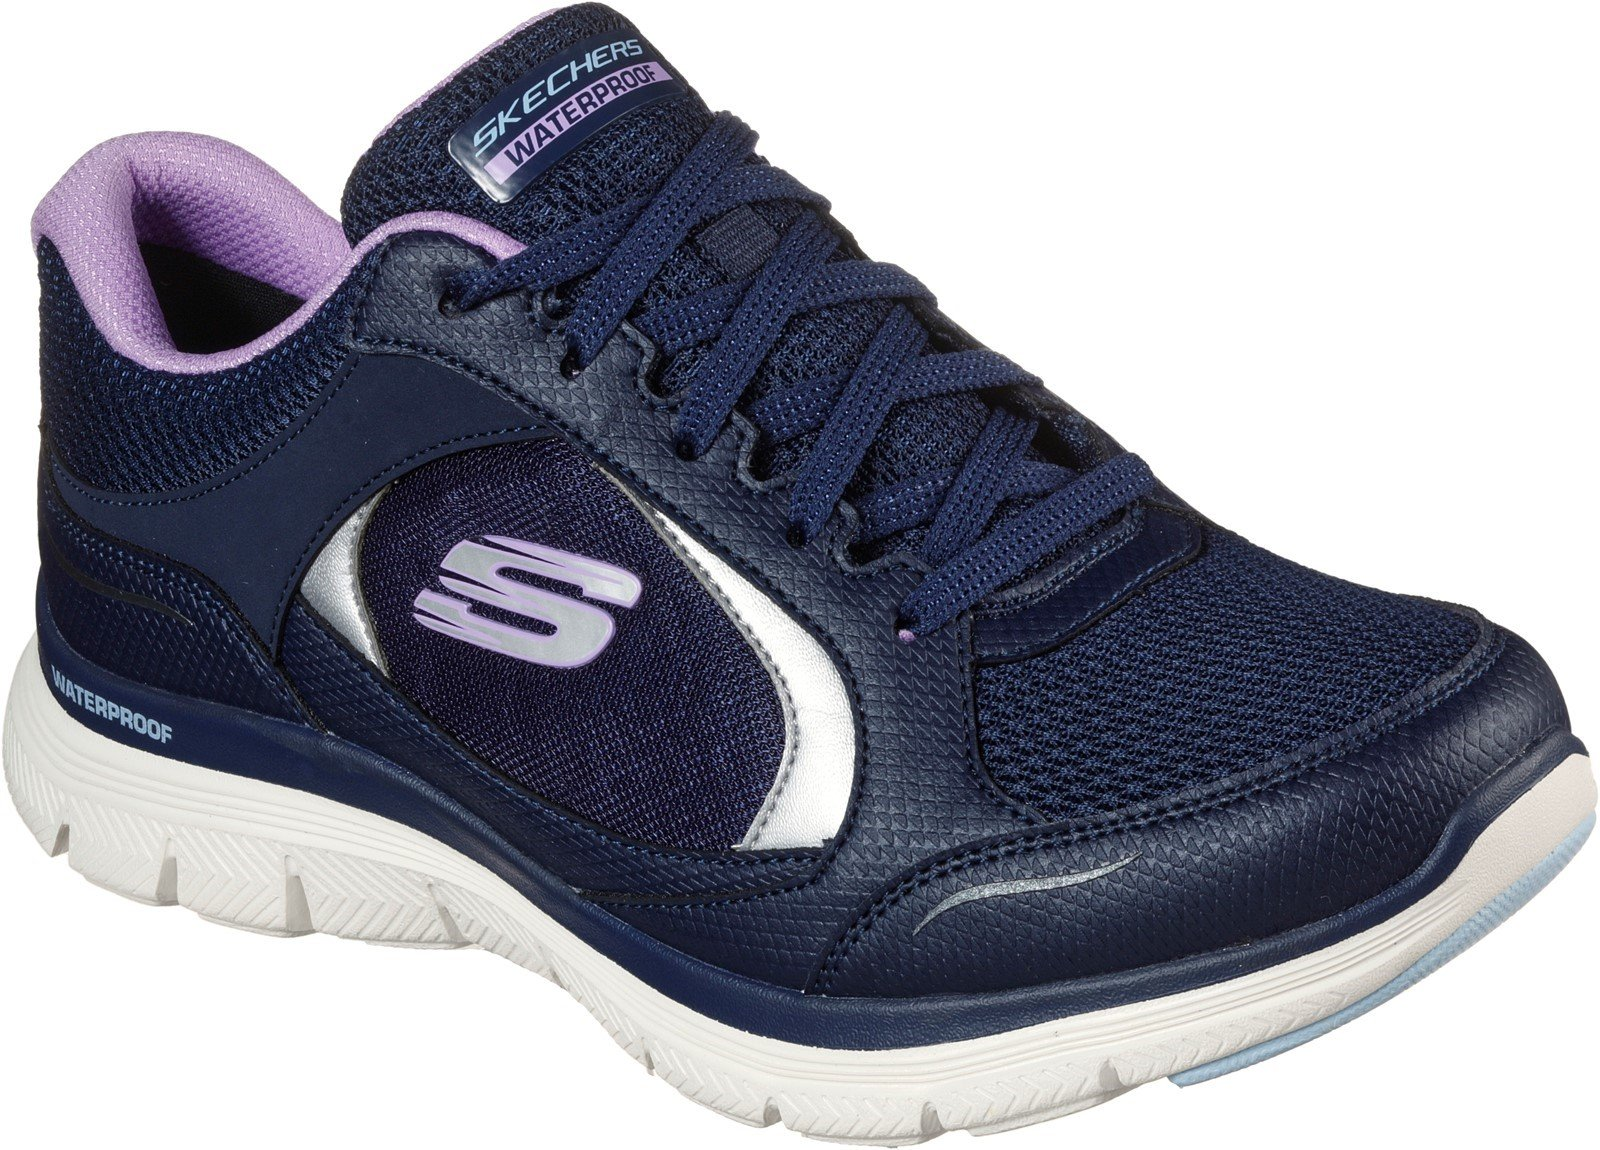 Skechers Women's Flex Appeal 4.0 Clarity Sport Trainer Various Colours 32113 - Navy/Lavender 3